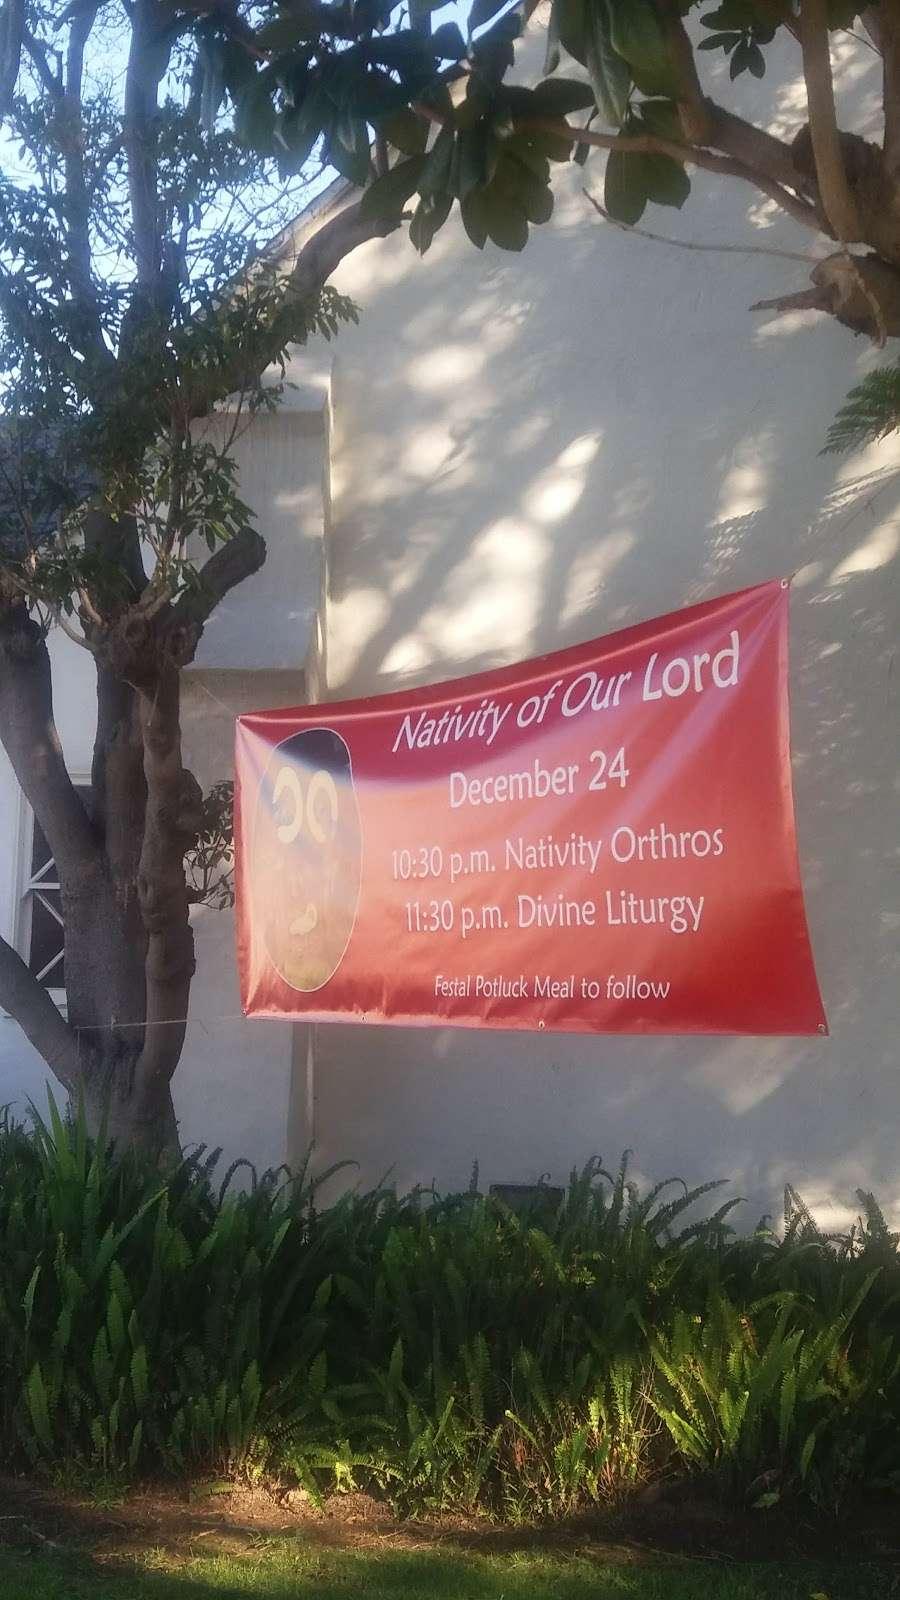 St Matthew Orthodox Christian Church - church  | Photo 8 of 9 | Address: 2368 Sonoma St, Torrance, CA 90501, USA | Phone: (310) 782-9468